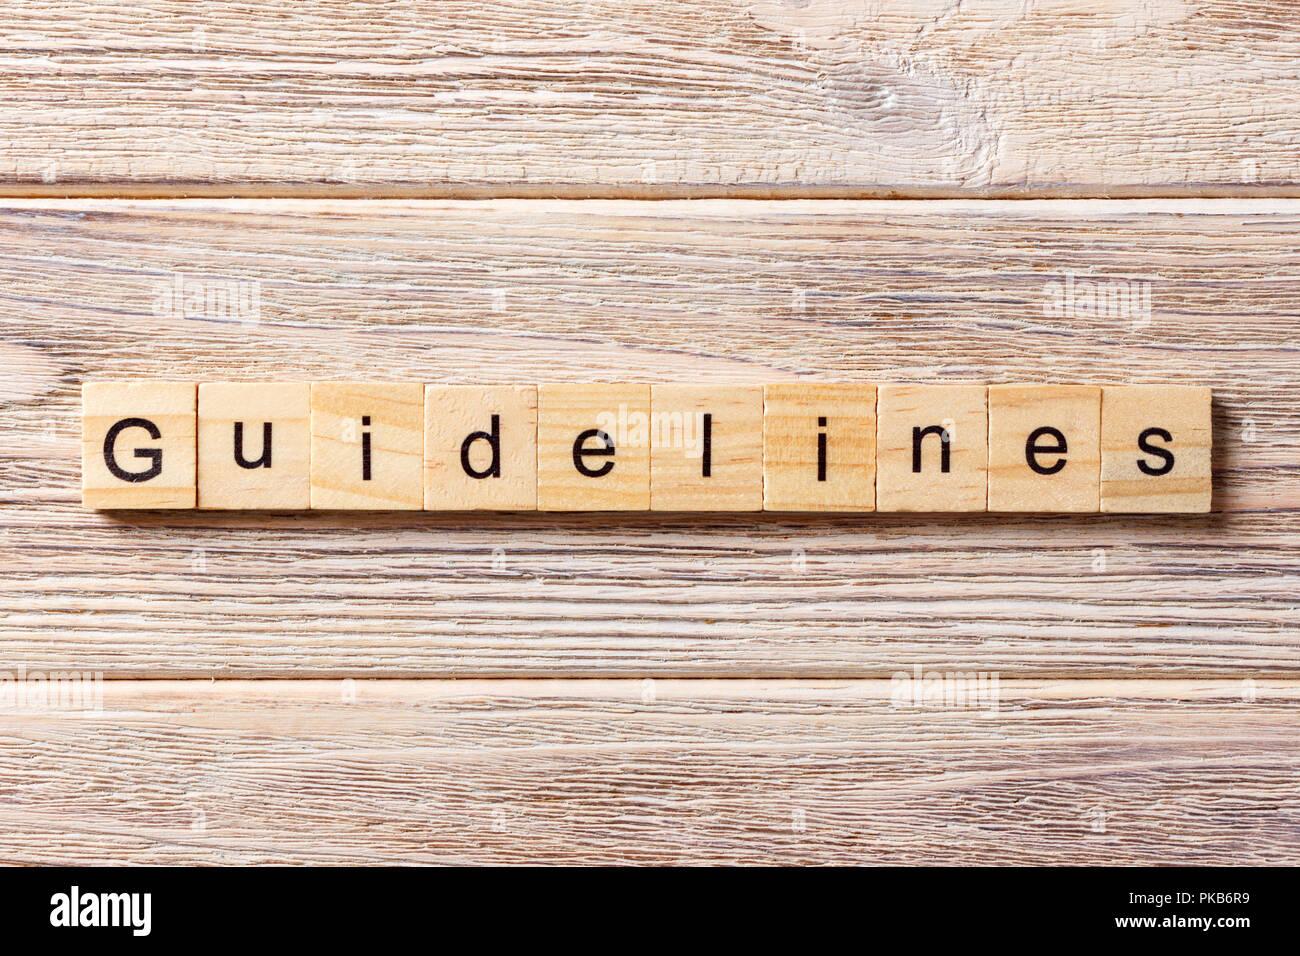 Directrices palabra escrita sobre un bloque de madera. Directrices sobre la mesa, el concepto de texto. Imagen De Stock